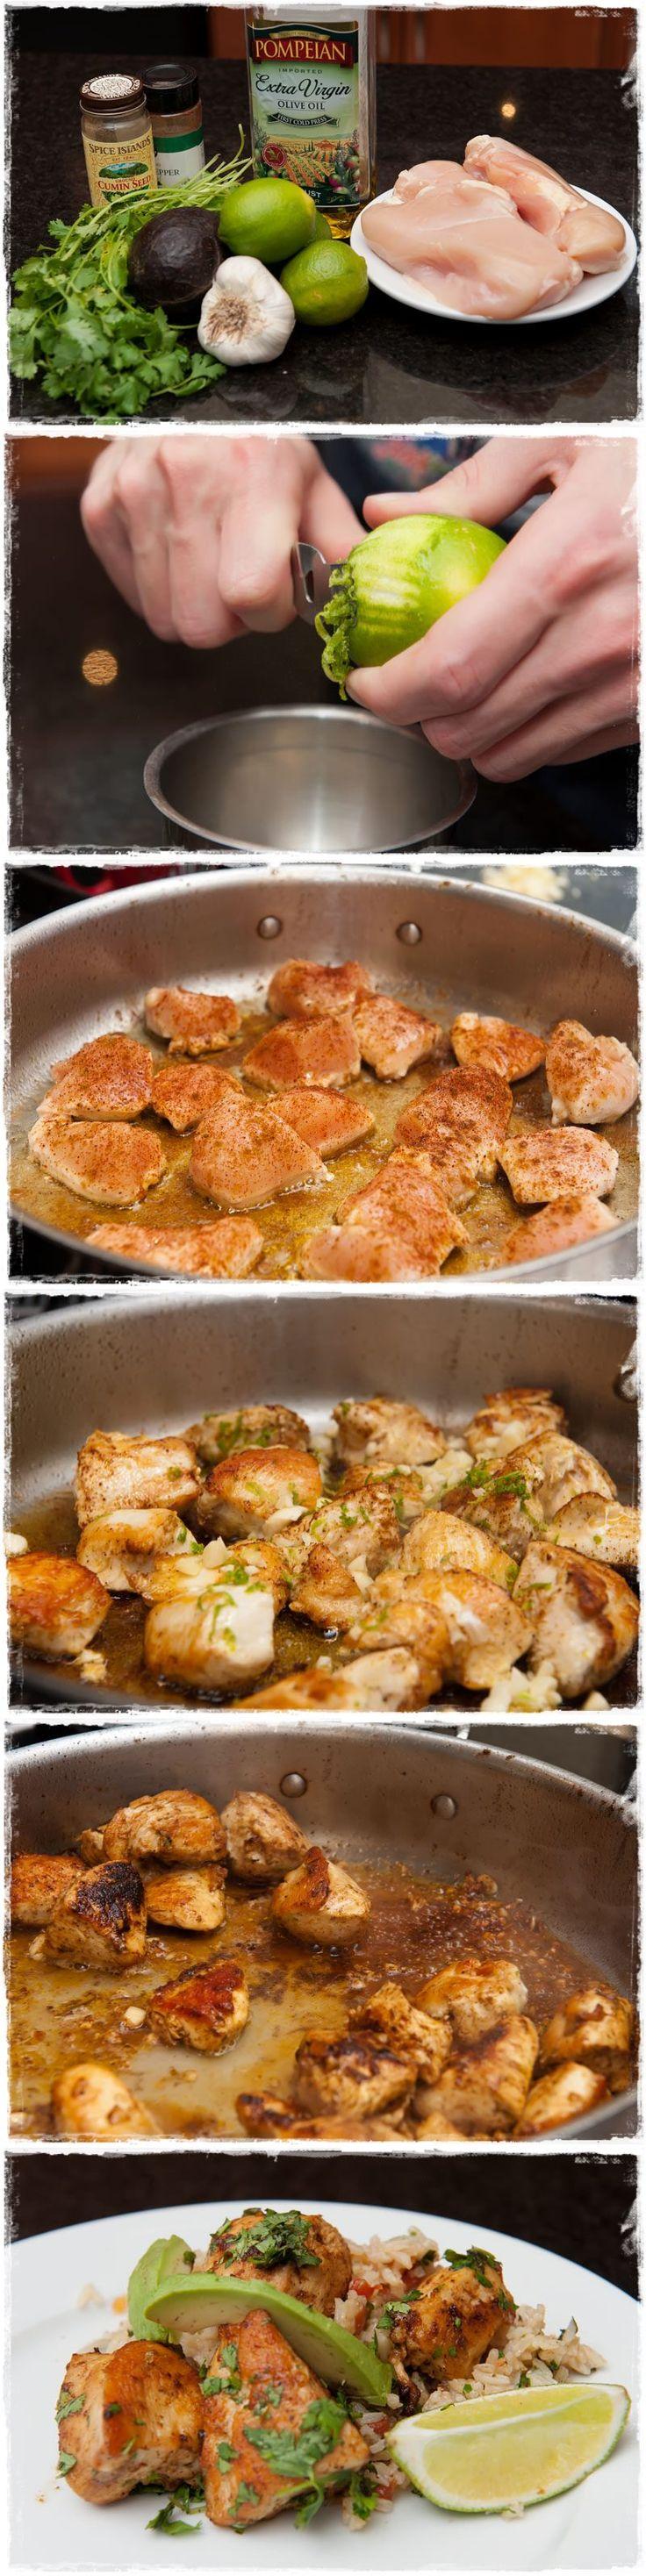 cilantro chicken